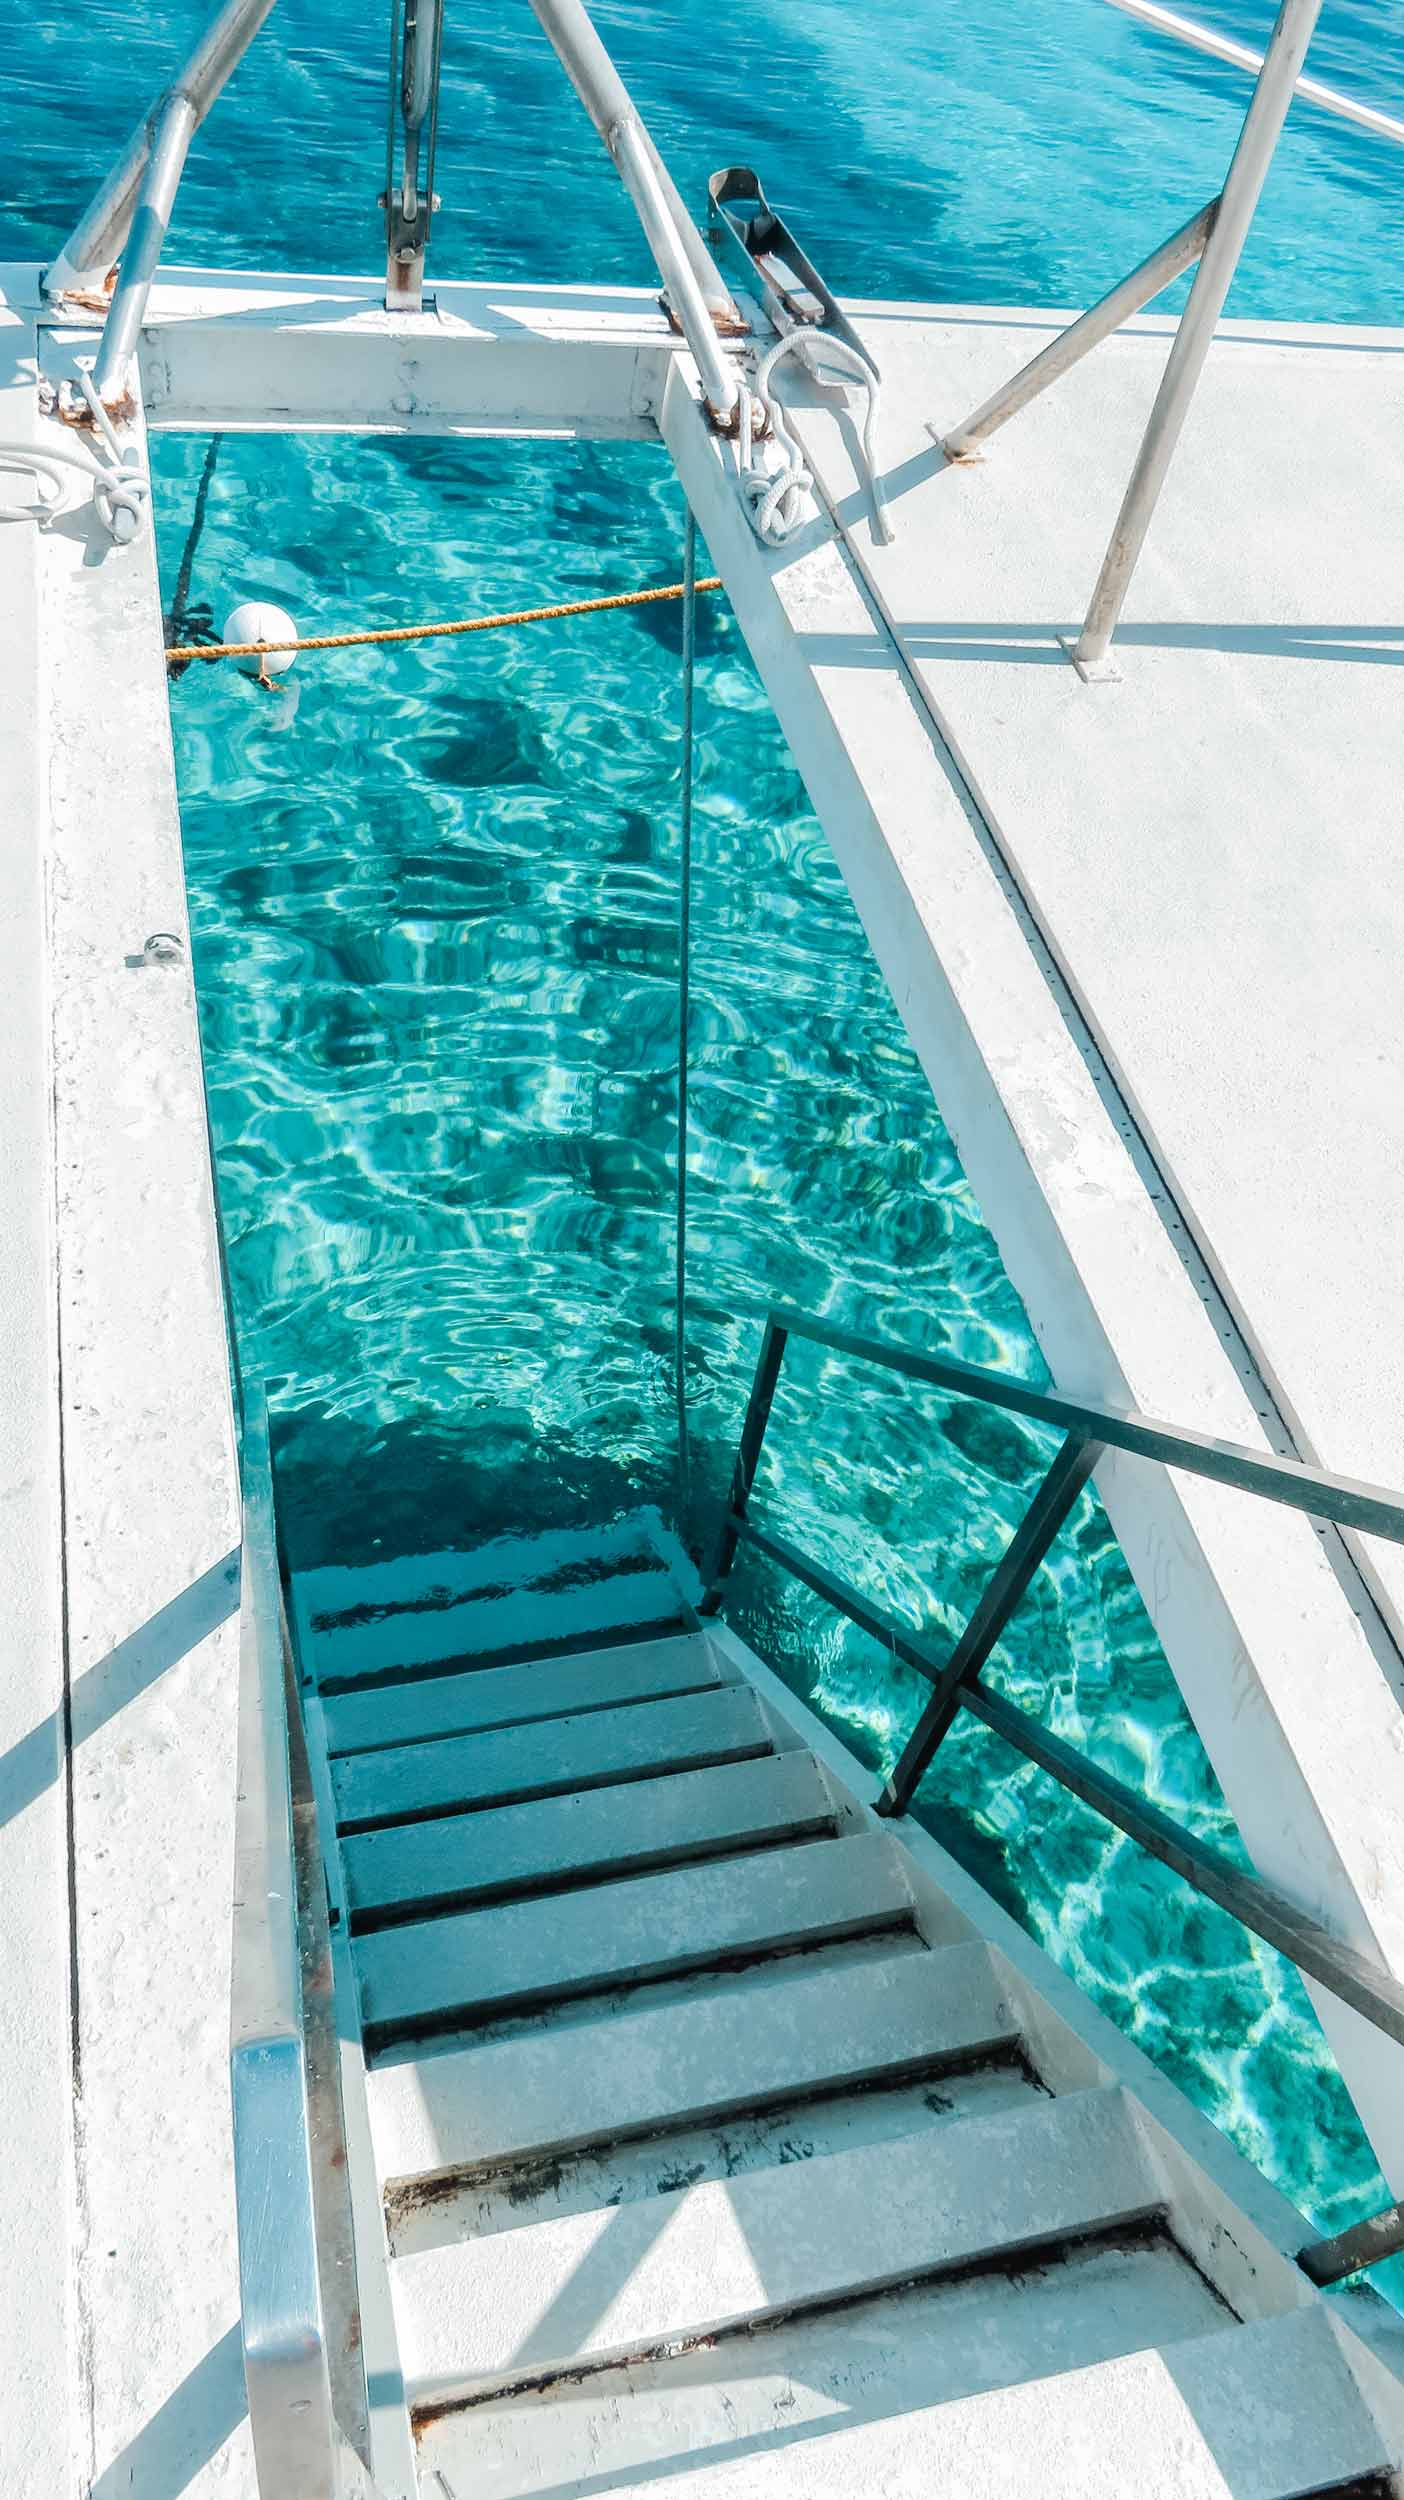 Mittelamerika-Kreuzfahrt-Roatan-Honduras-Ausflug-Katamaran-Wasser